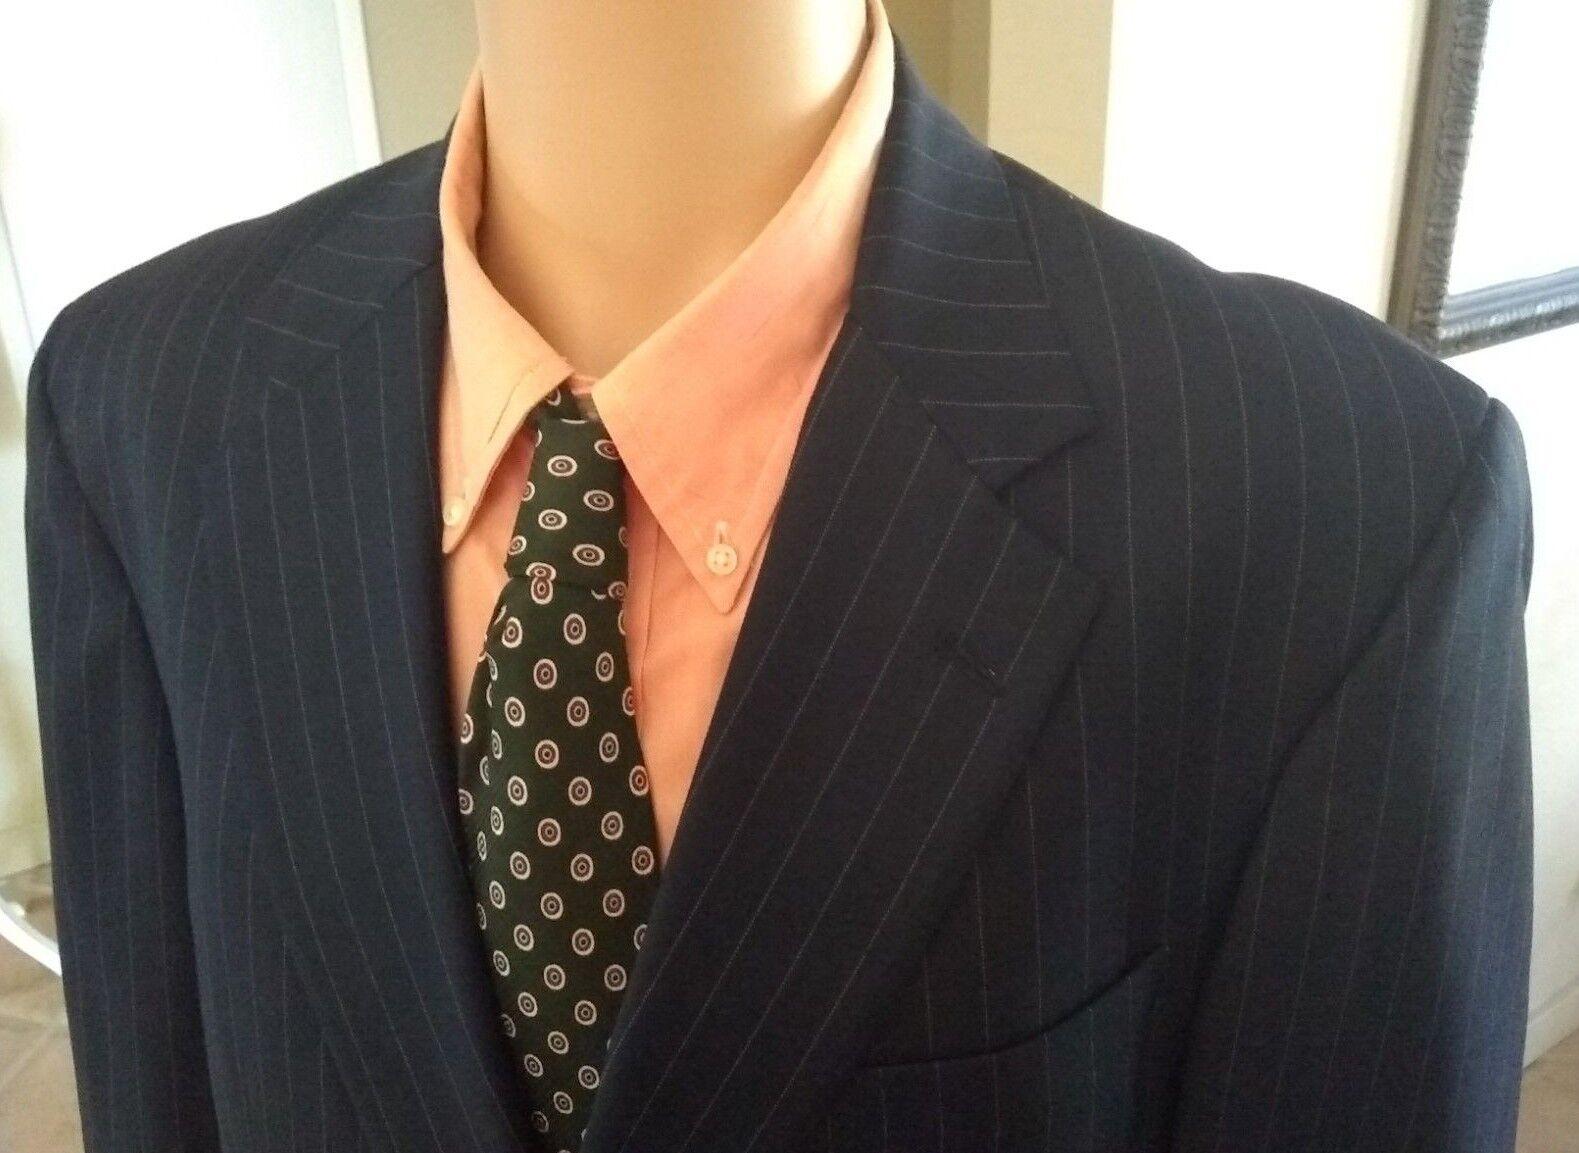 Carroll & Co. Bespoke Dark Navy Pinstripe 2 Btn. Suit Super 120s 42R 36-37x29